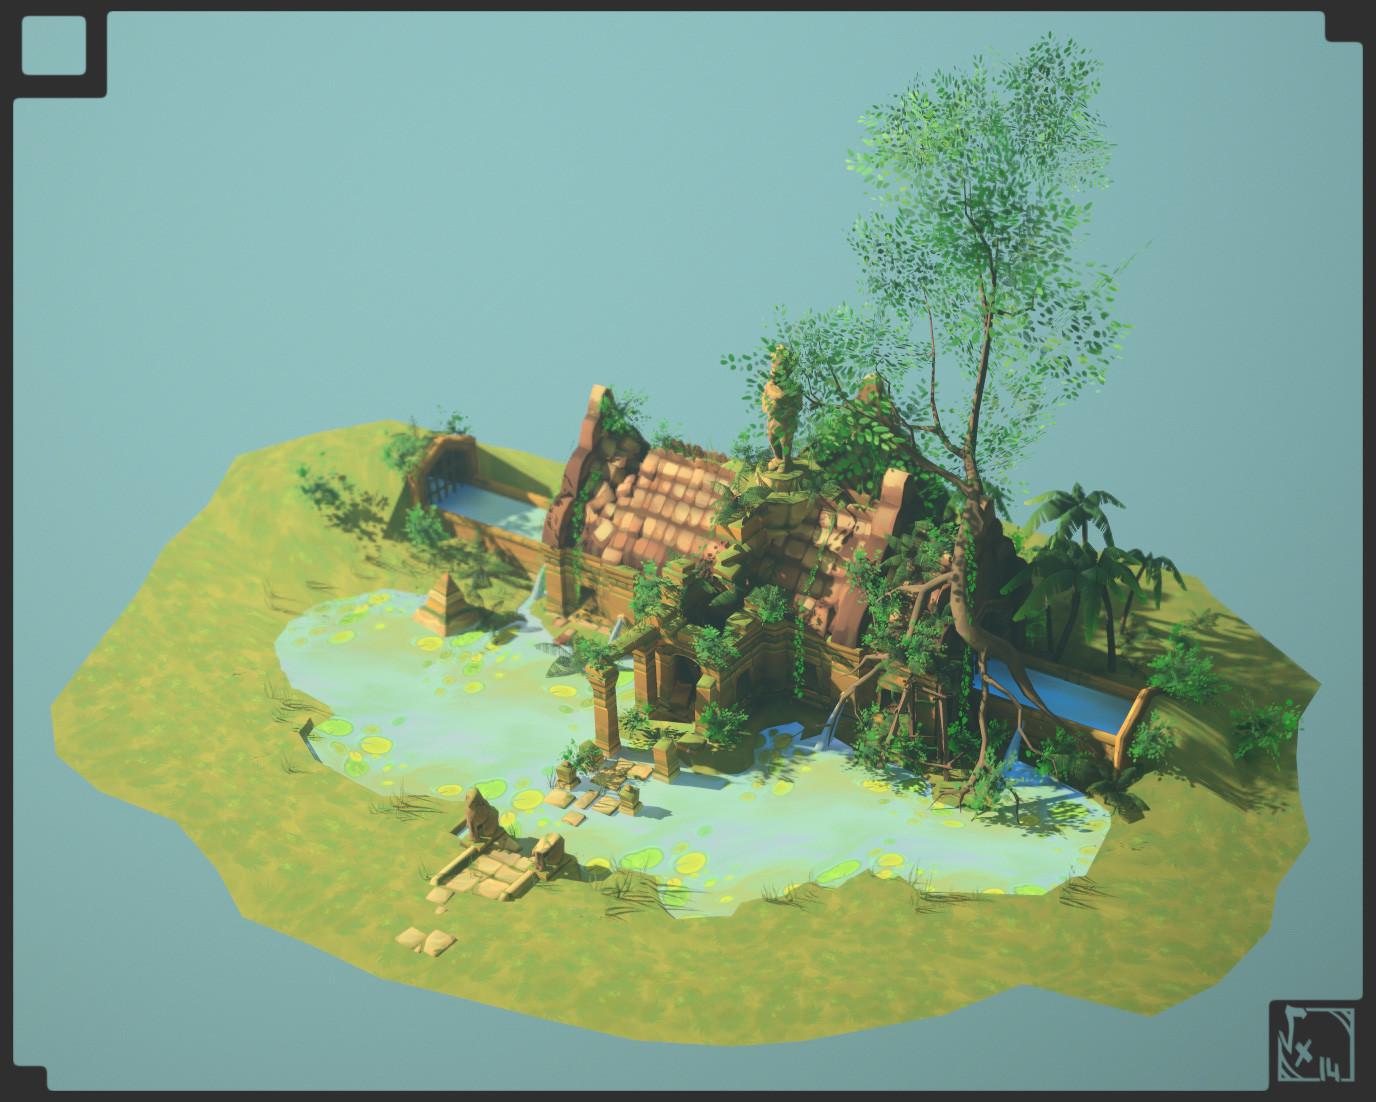 etienne-beschet-set-ruins-02.jpg?1547458